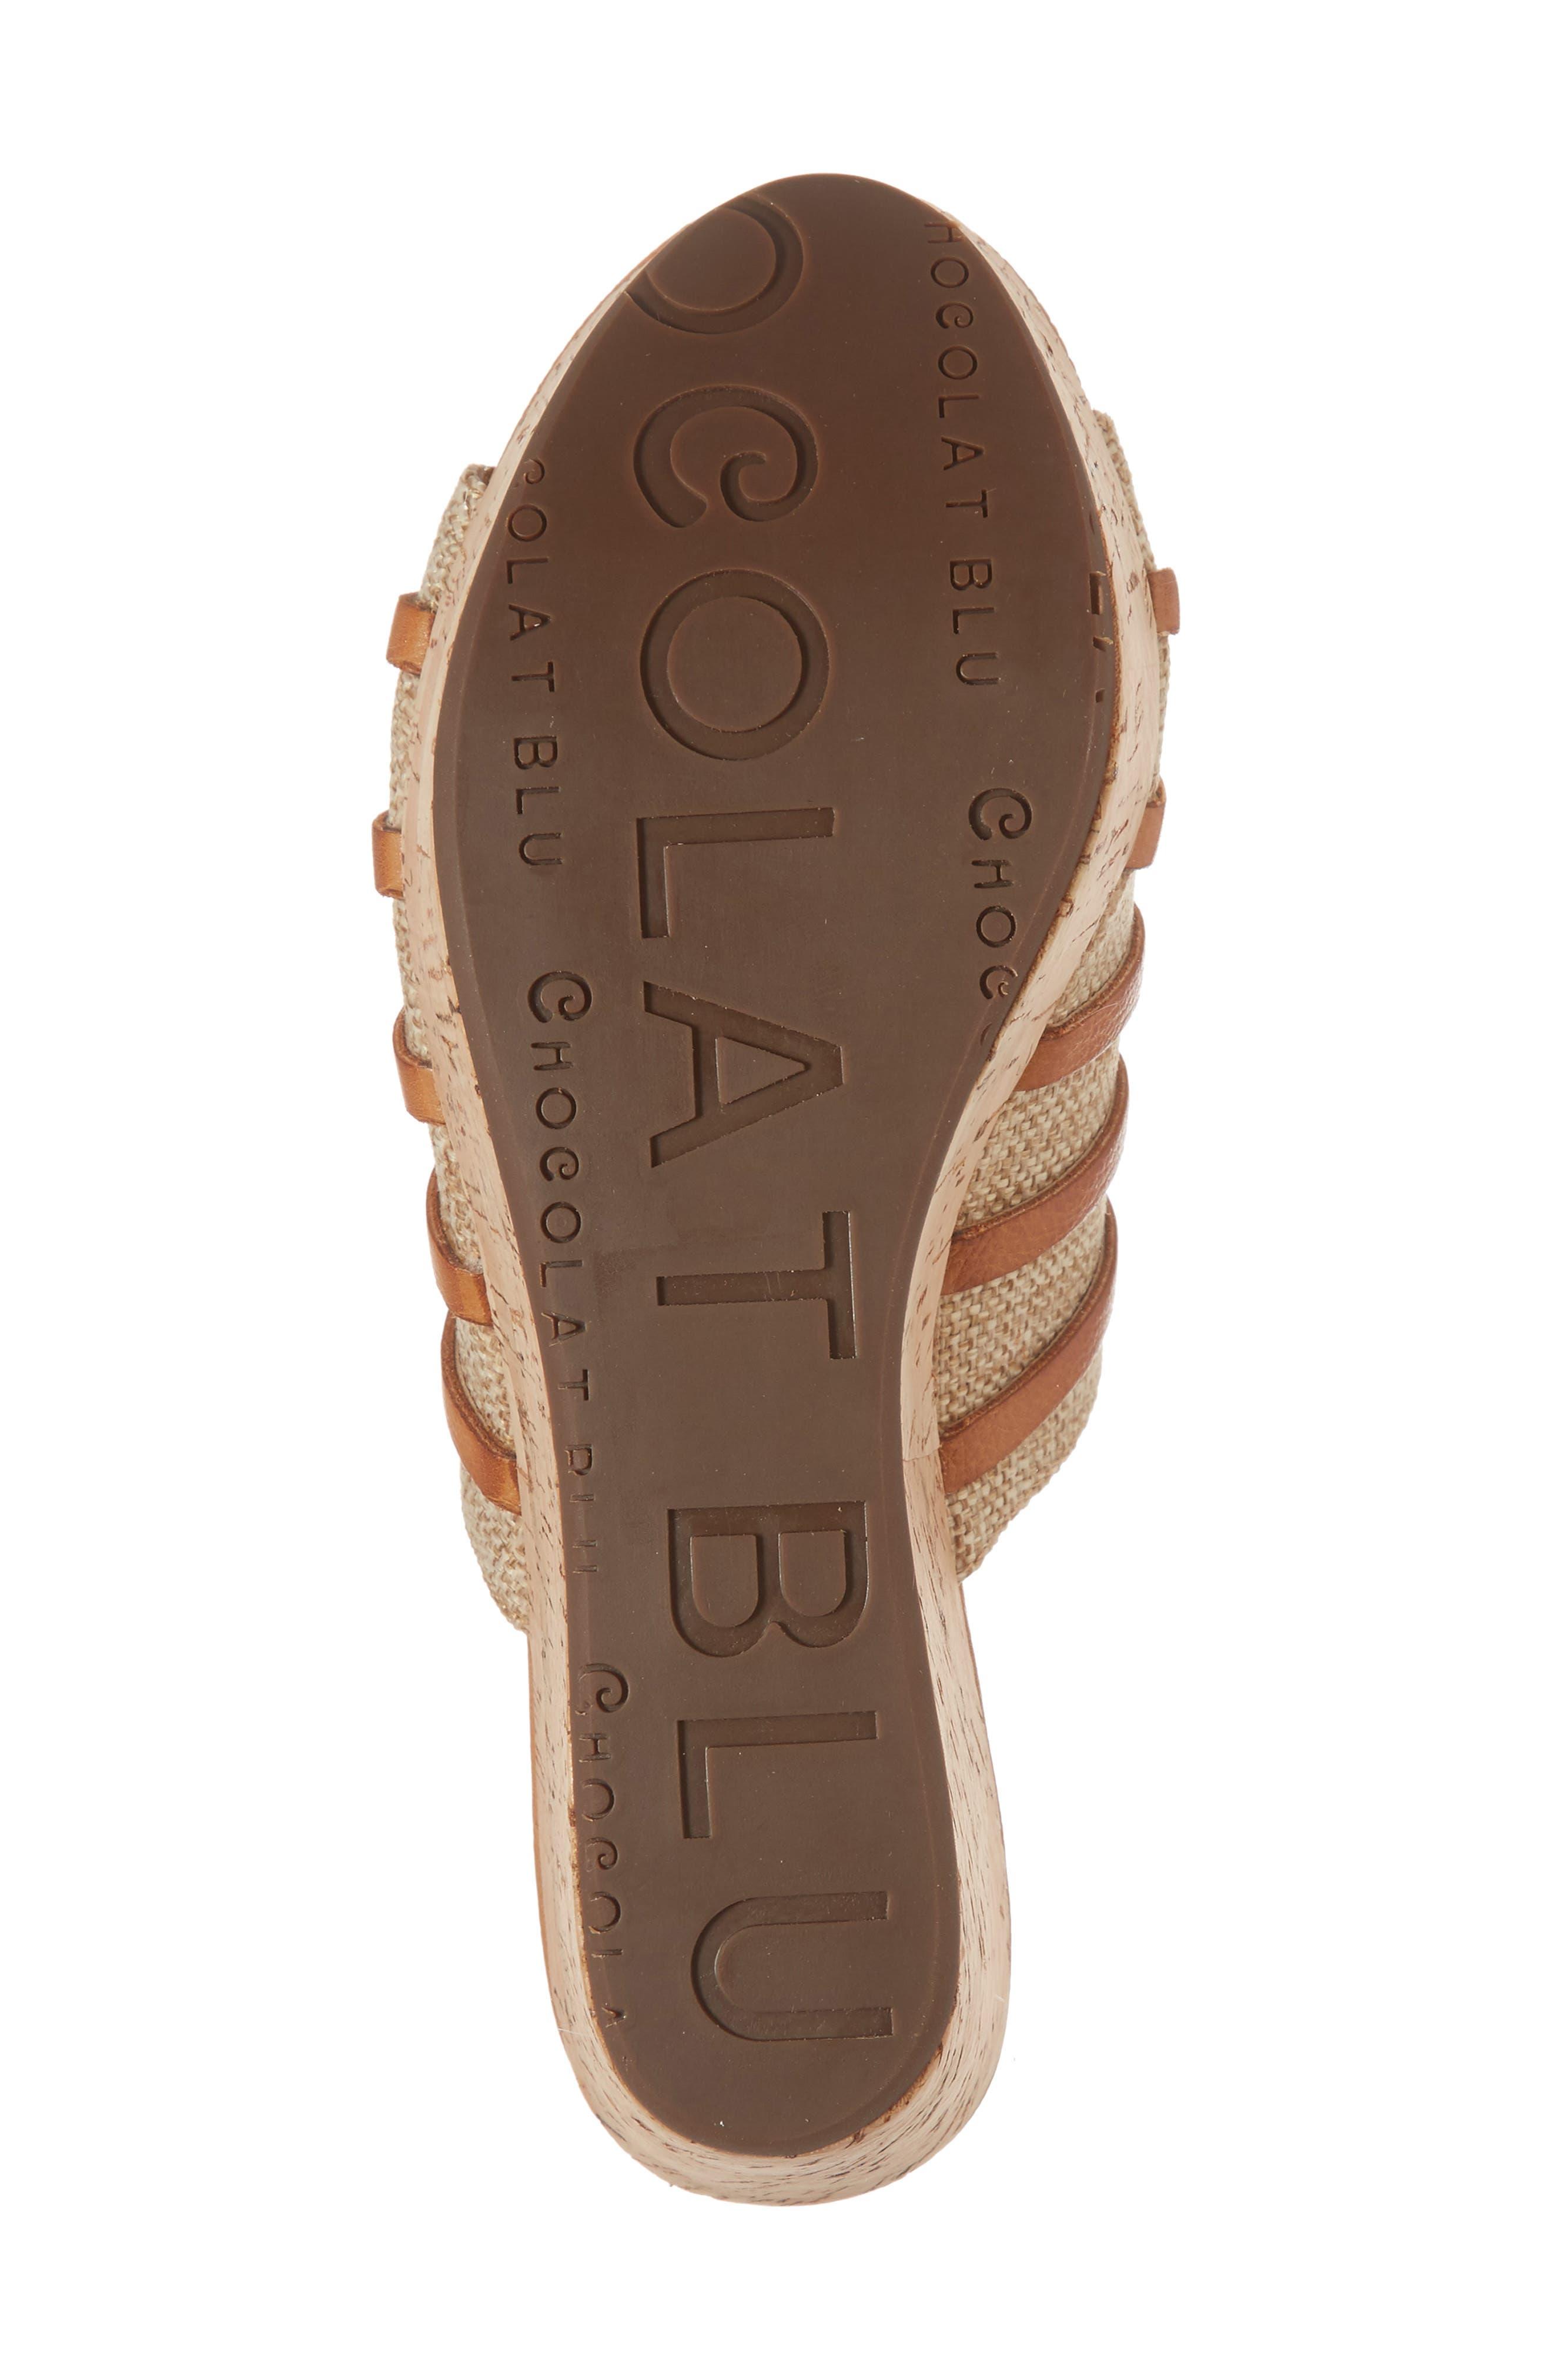 Wapi Wedge Sandal,                             Alternate thumbnail 6, color,                             Camel Leather